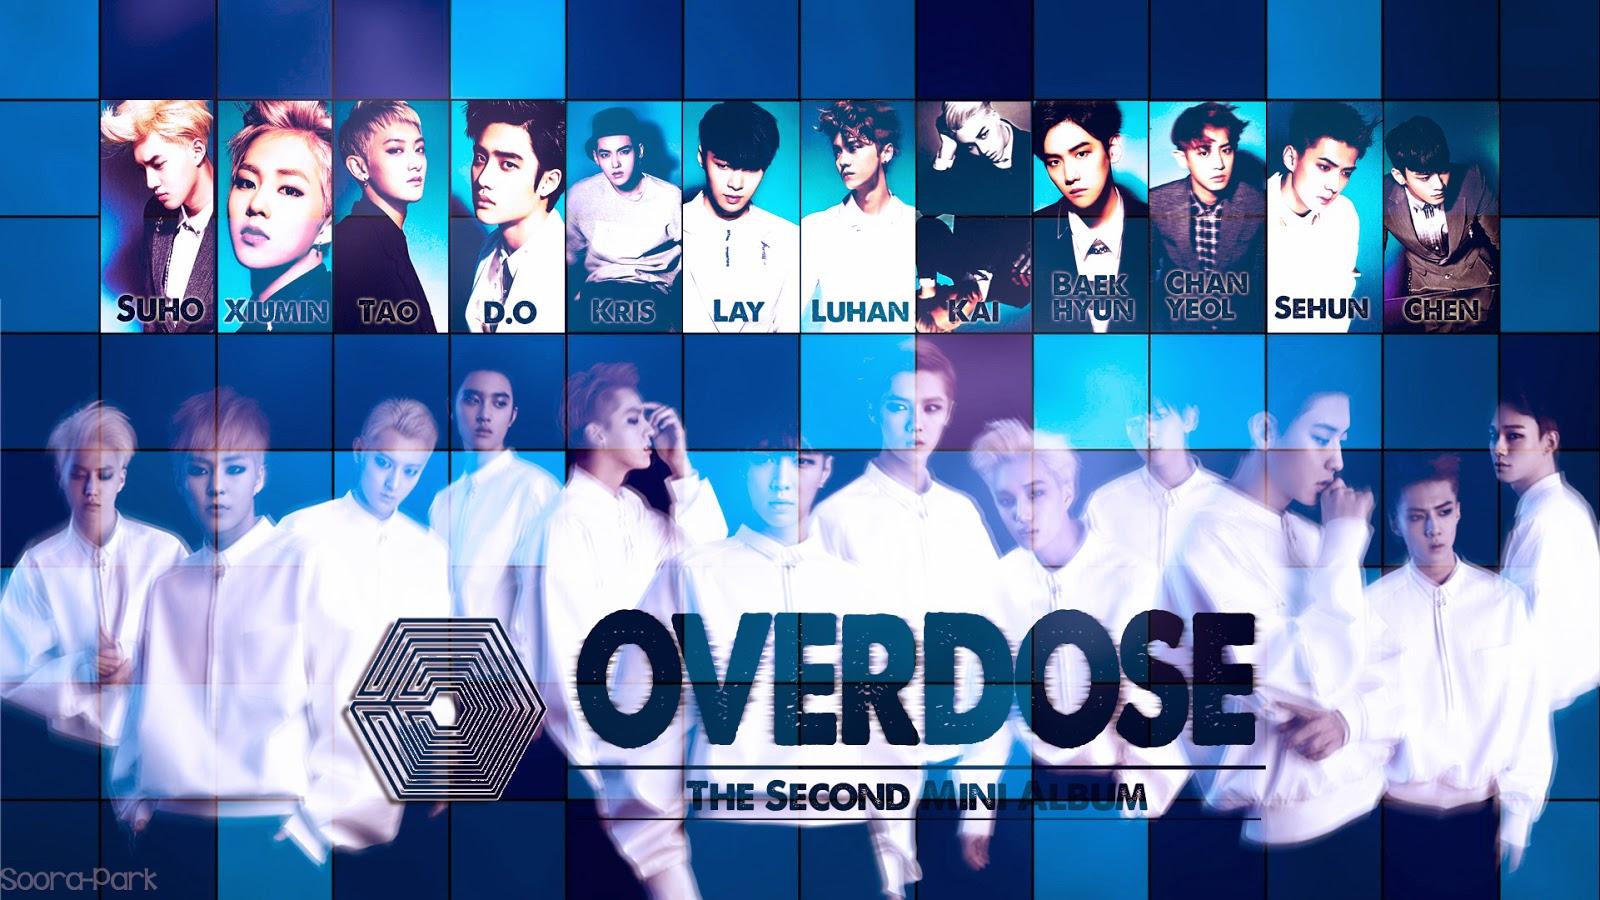 Fantasy Purple Sunset: EXO (12 Member) - Overdose (Blue Square Effect)